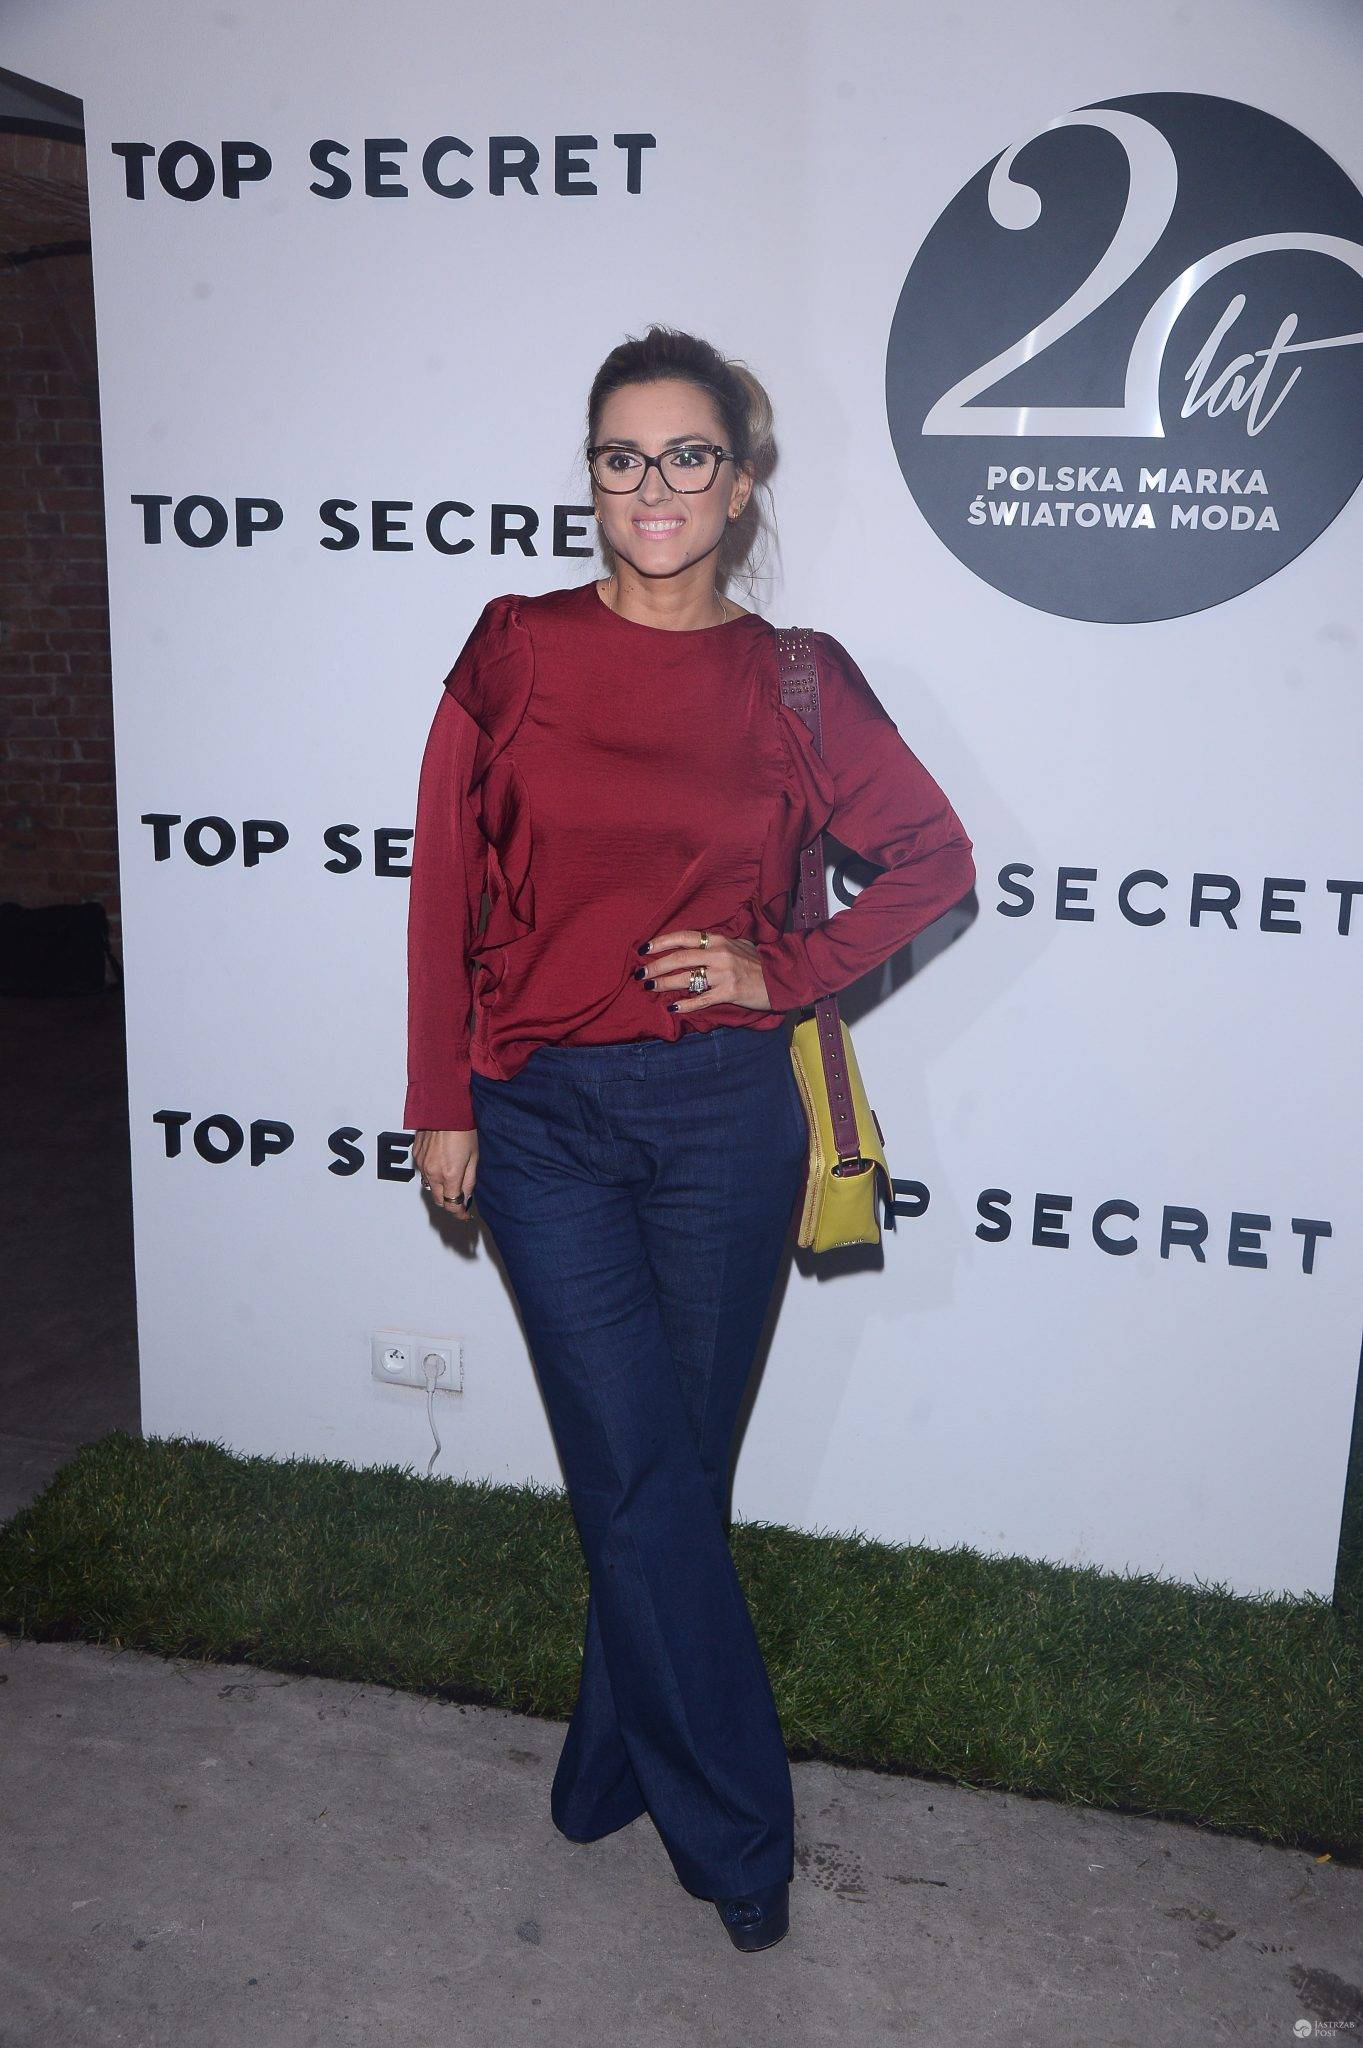 Karolina Szostak - 20 lat Top Secret